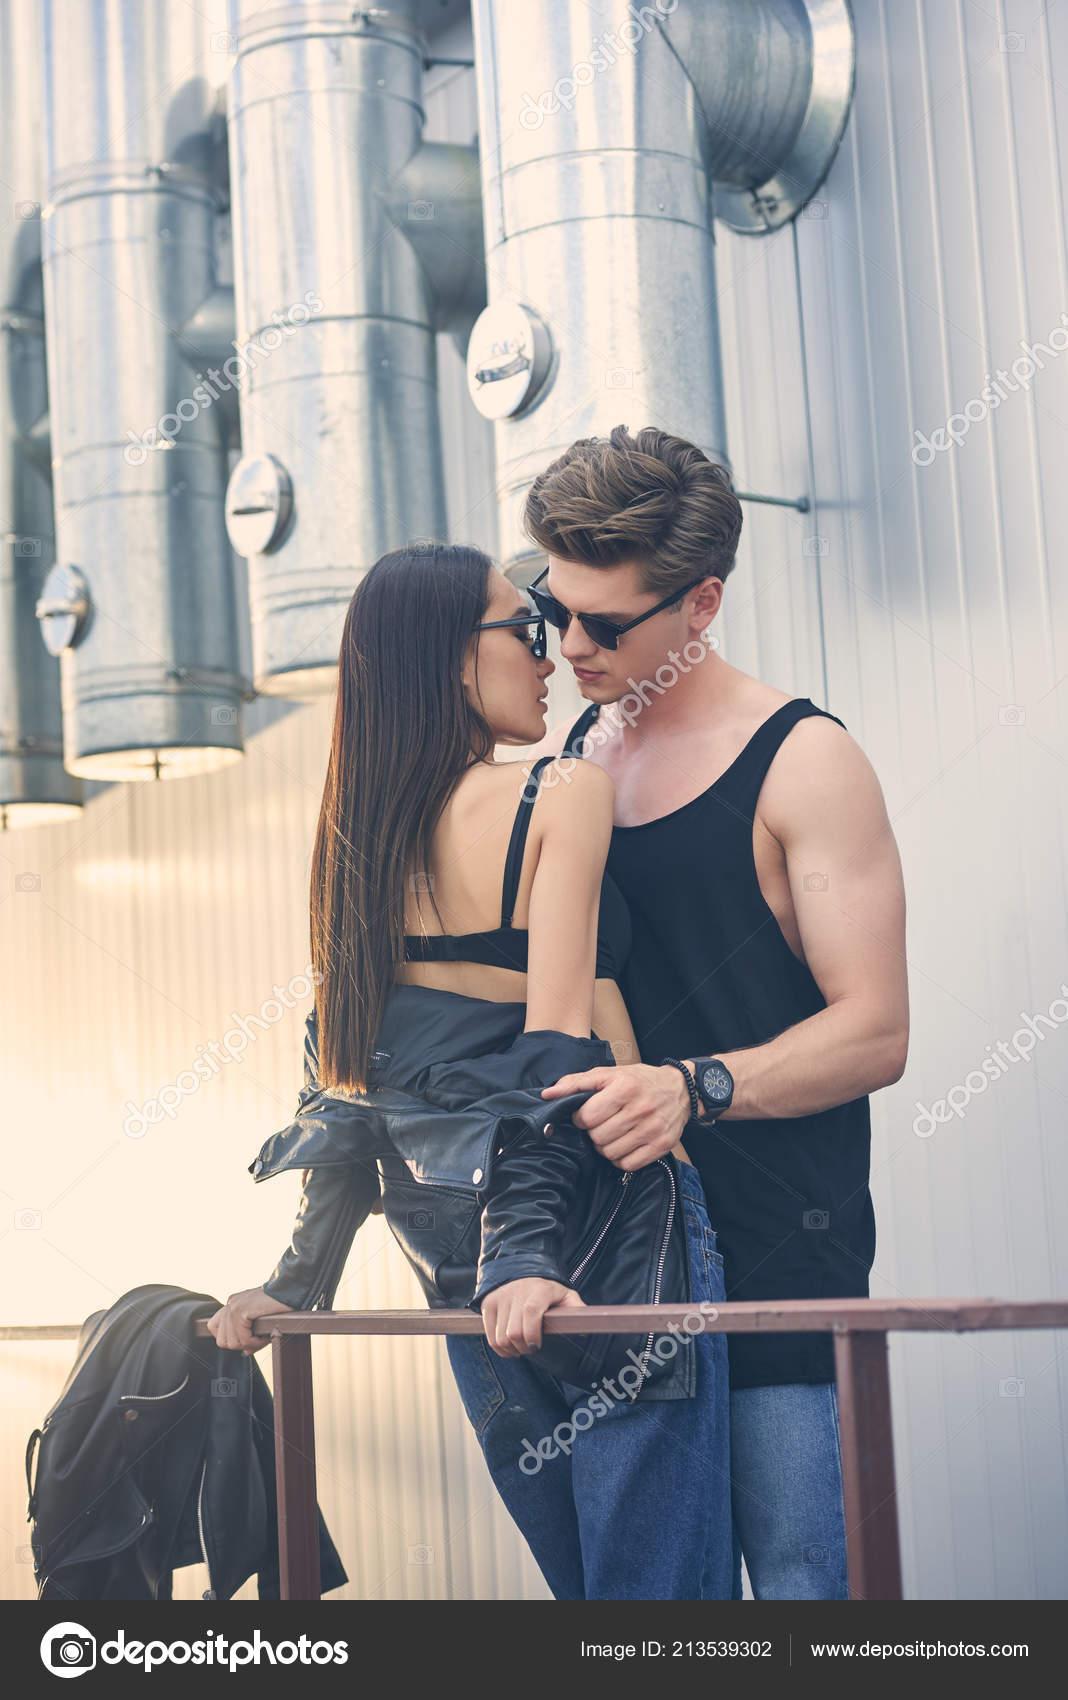 Russisk datingside verste bilder